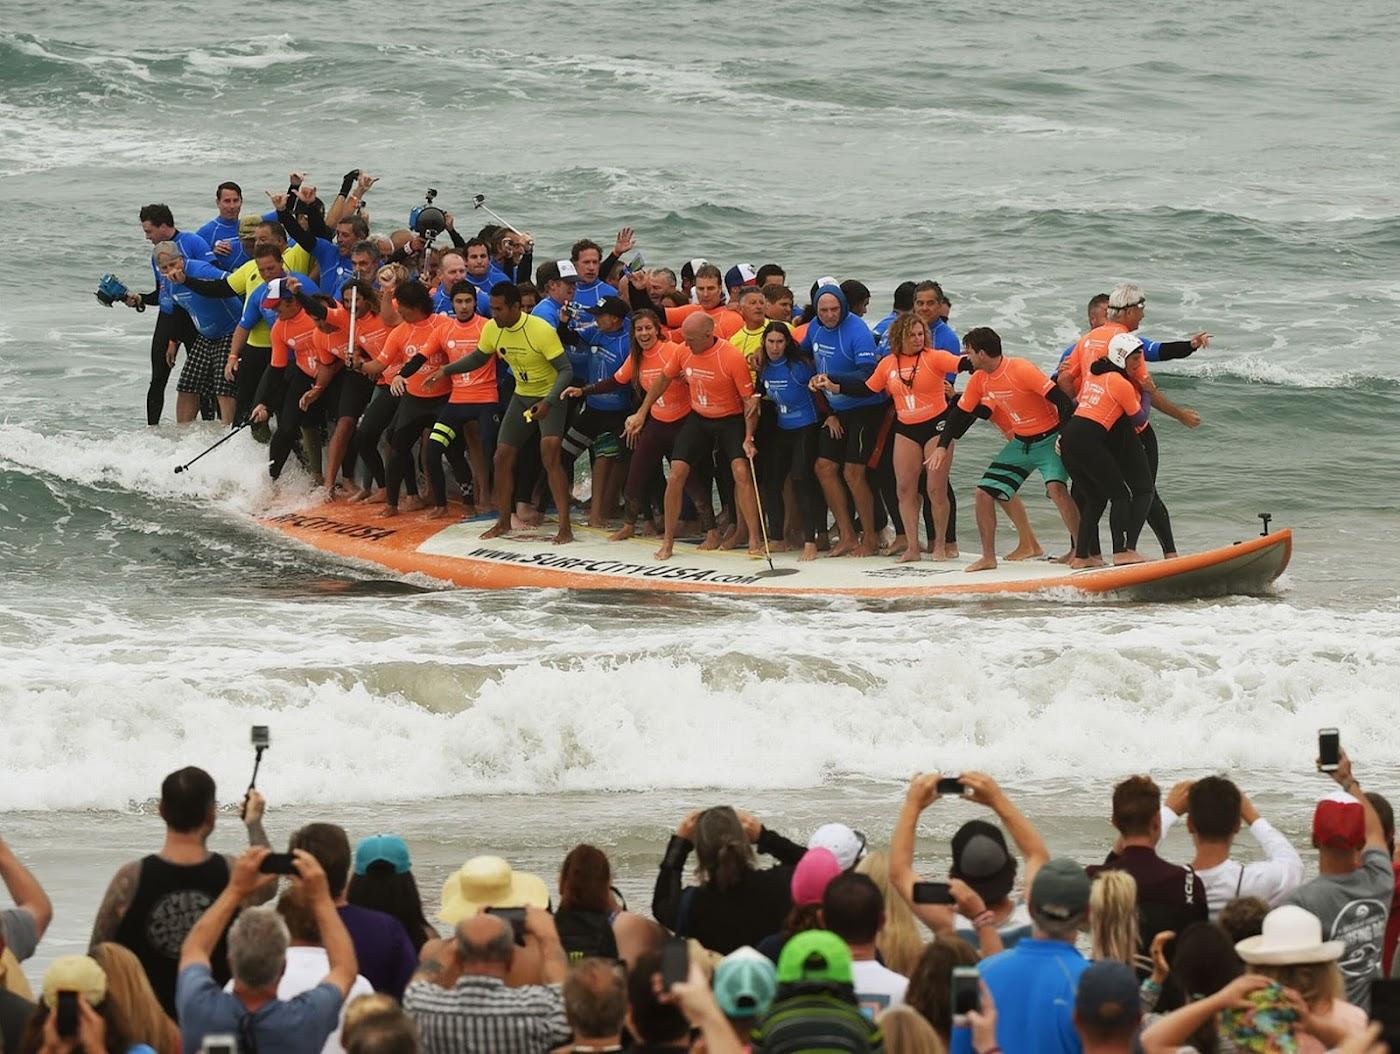 Worlds largest surfboard 07